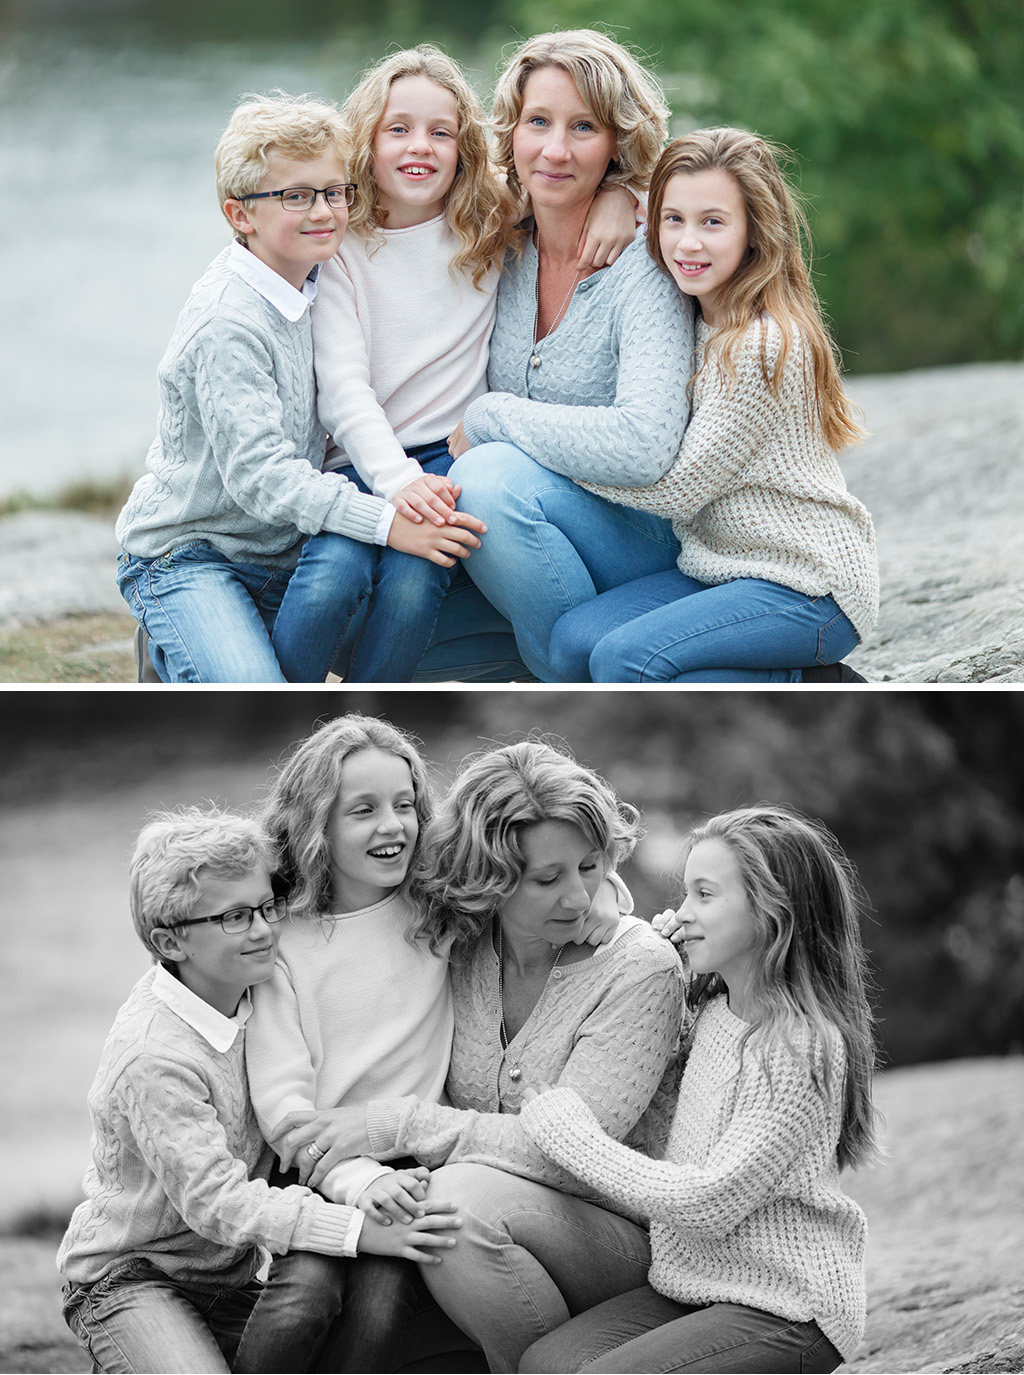 Familjefotografering_i-Stockholm_Lifestyle-familjefotograf-Anna-Sandstrom_7.jpg